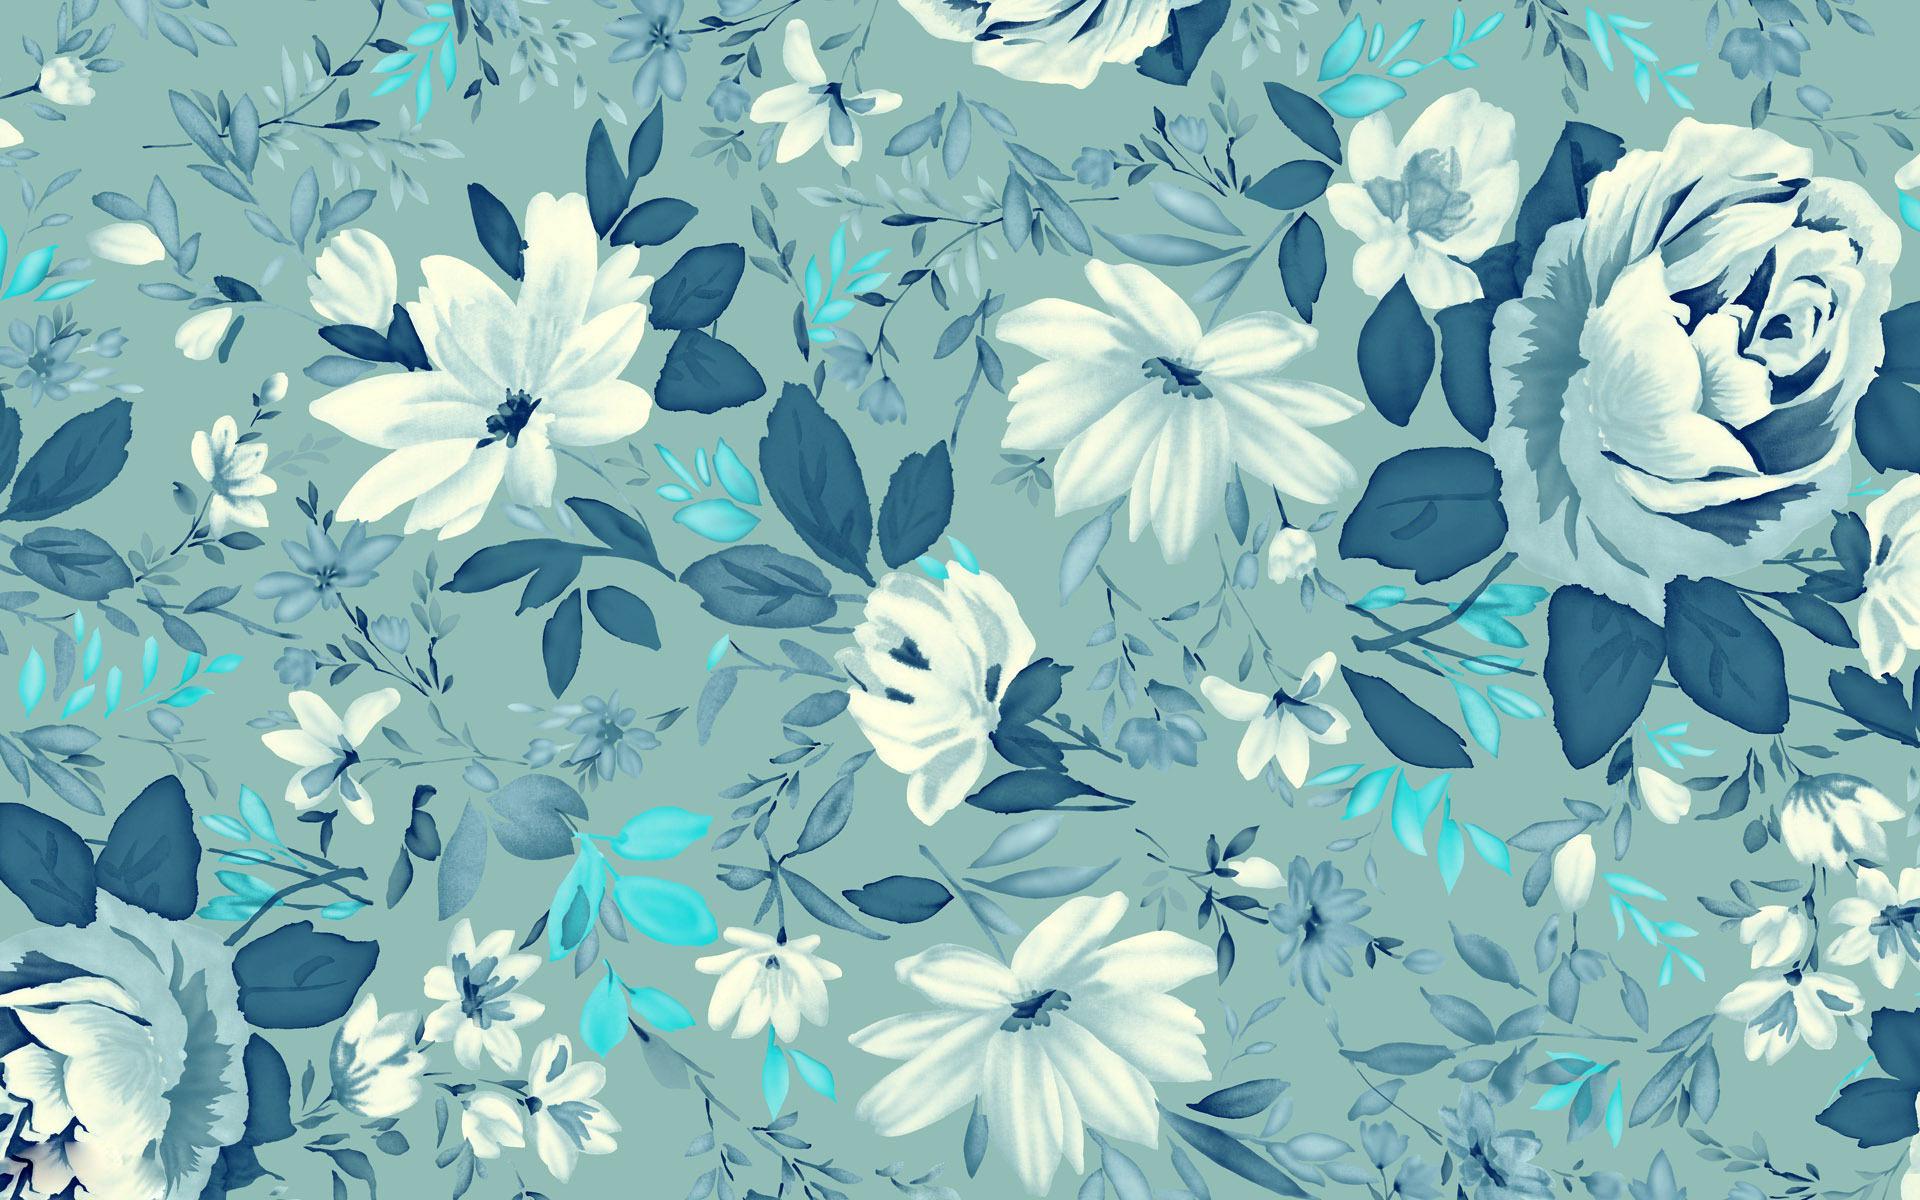 Vintage Wallpaper Floral Blue Hd Desktop Wallpapers 4k Hd